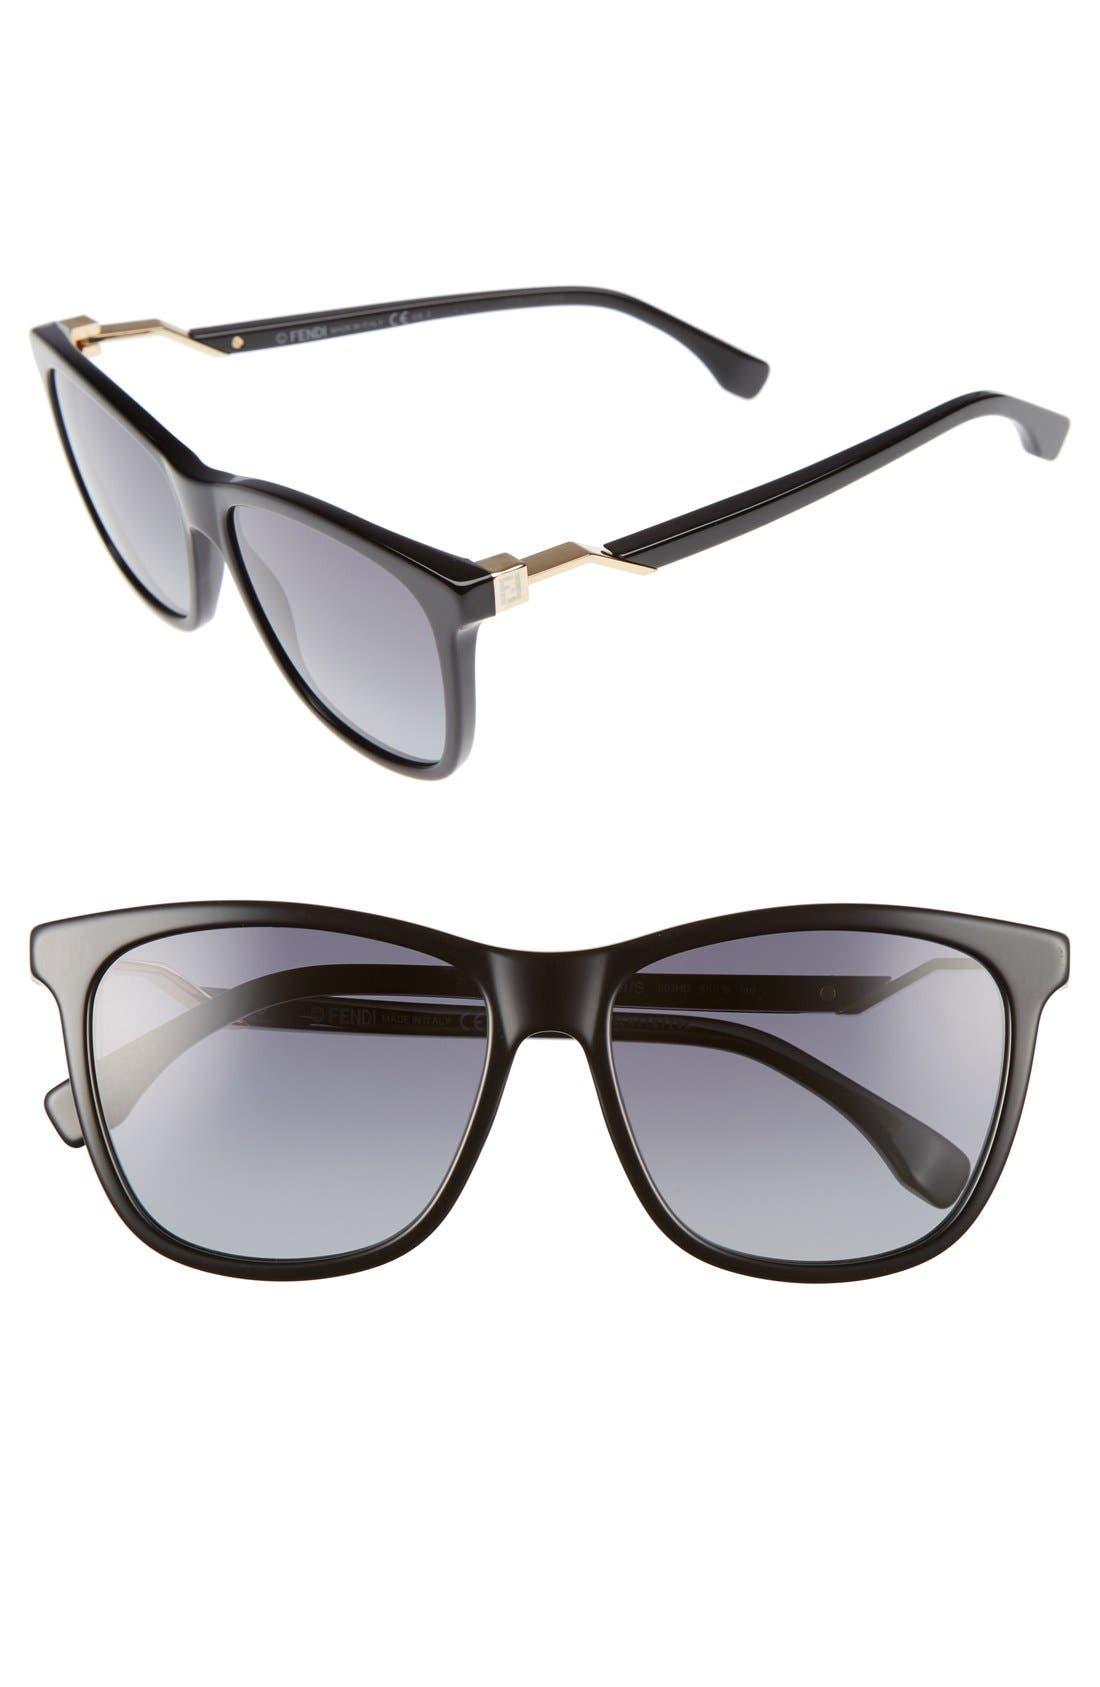 Main Image - Fendi 55mm Cube Retro Sunglasses